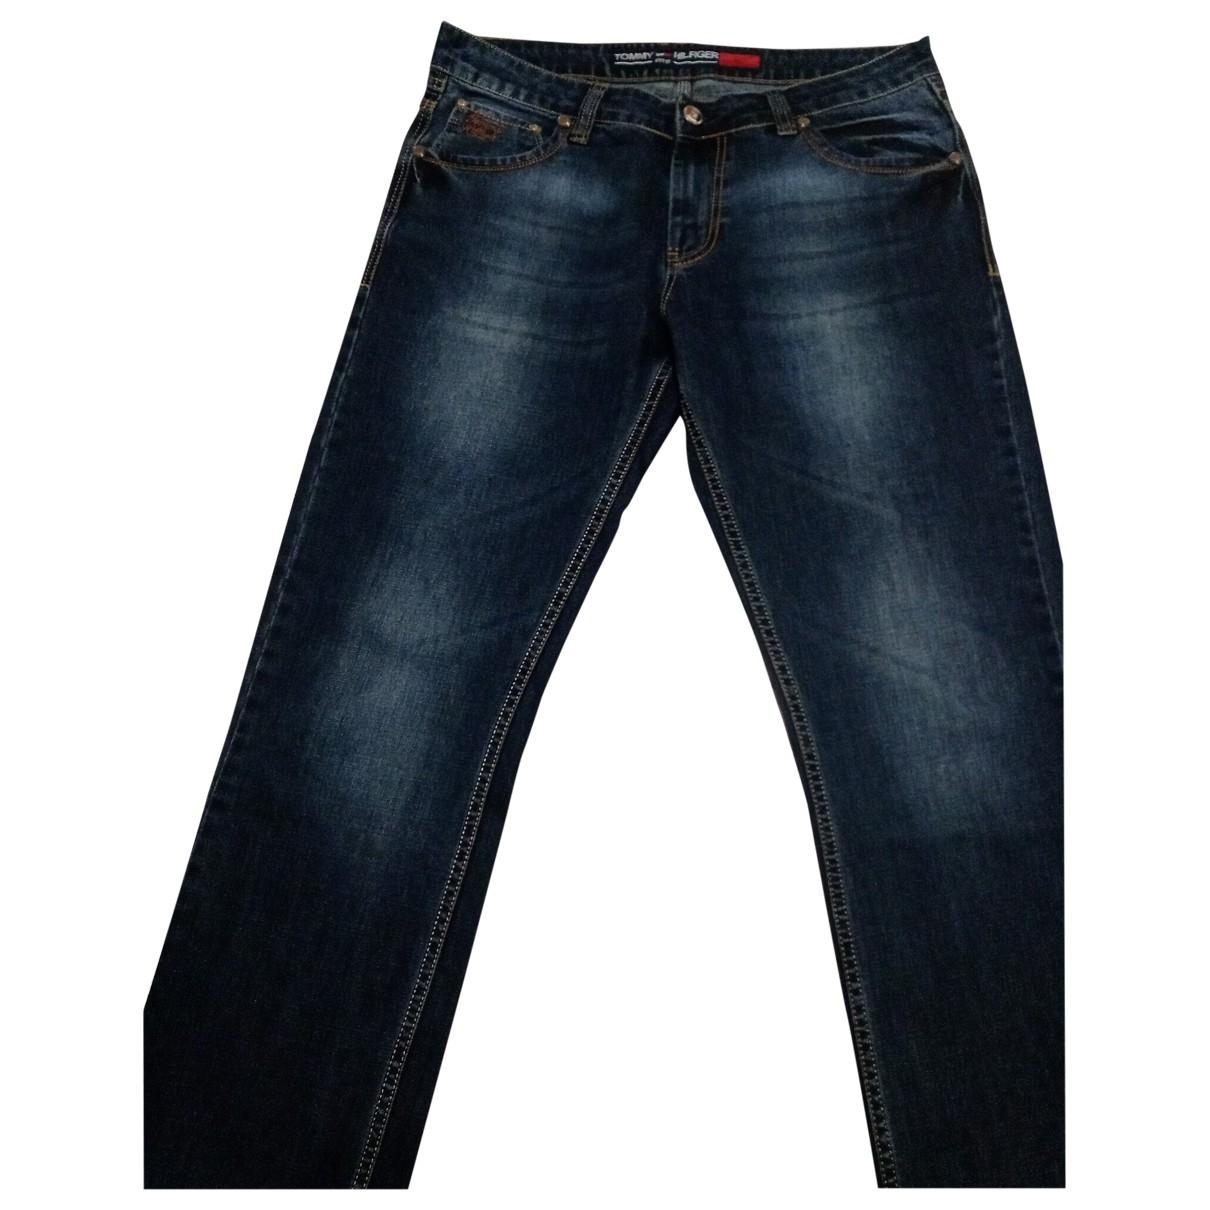 Tommy Hilfiger \N Blue Cotton - elasthane Jeans for Men 52 IT